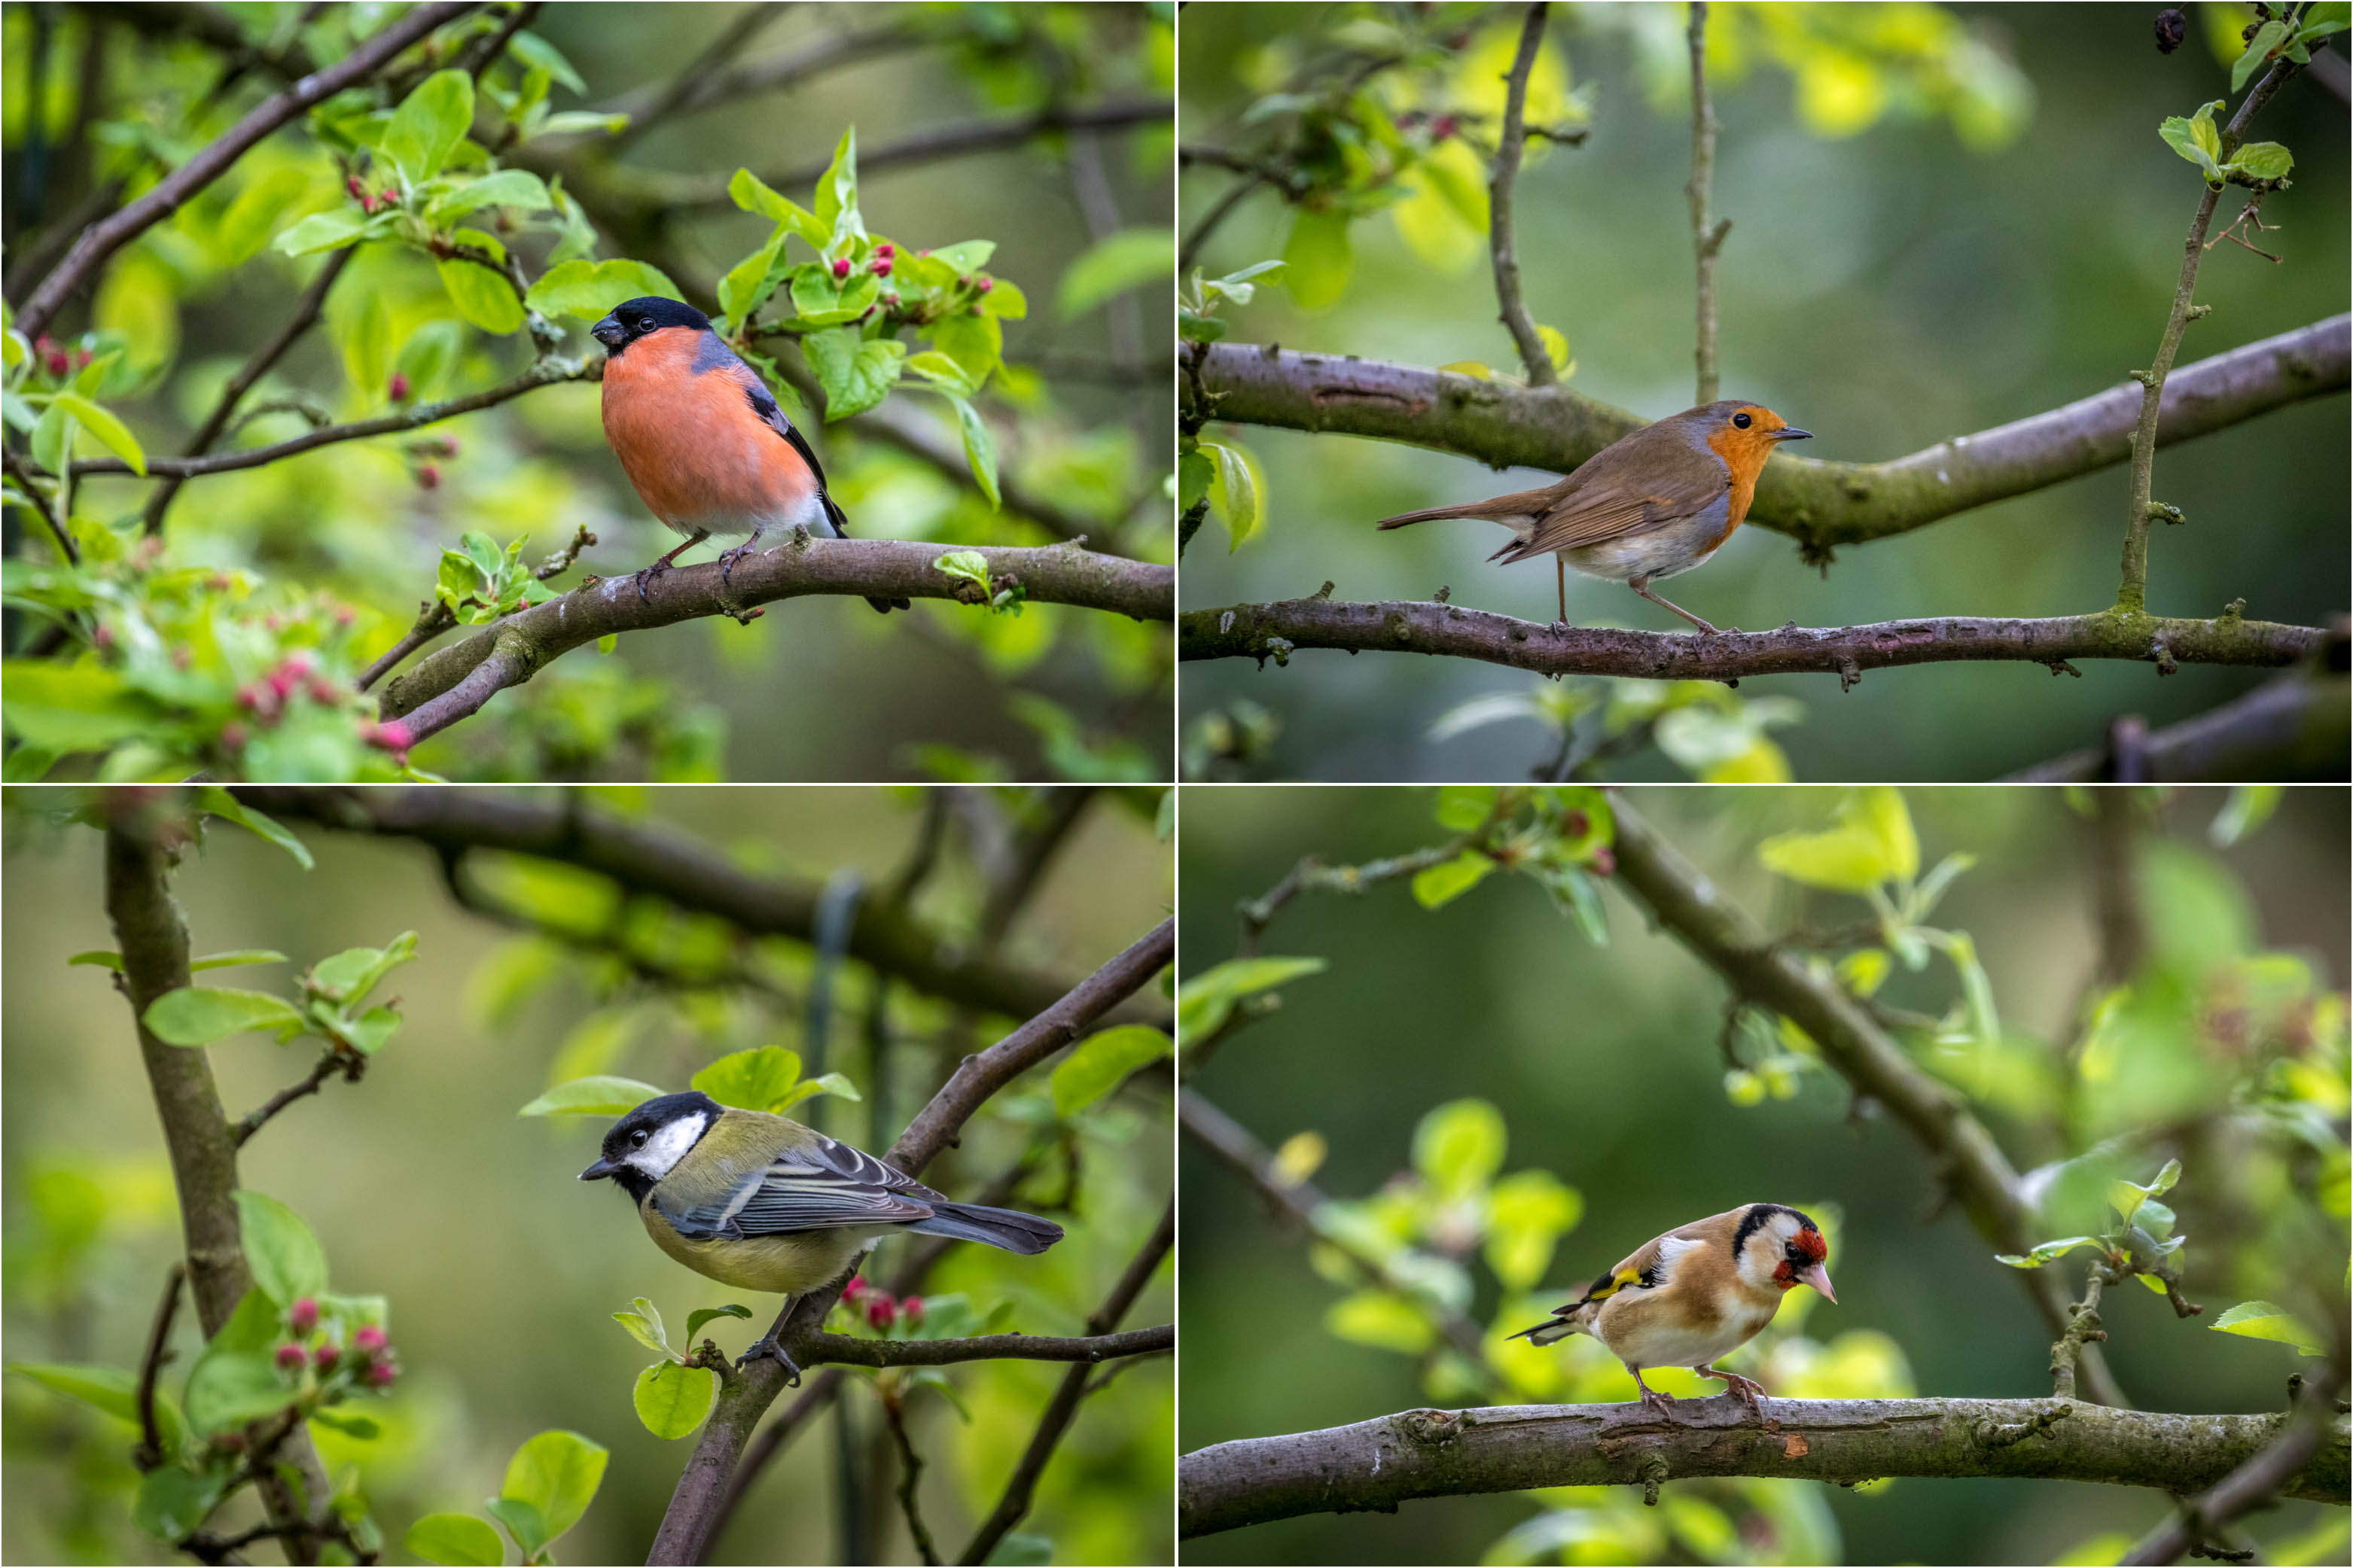 bullfinch, robin, great tit, goldfinch, garden birds